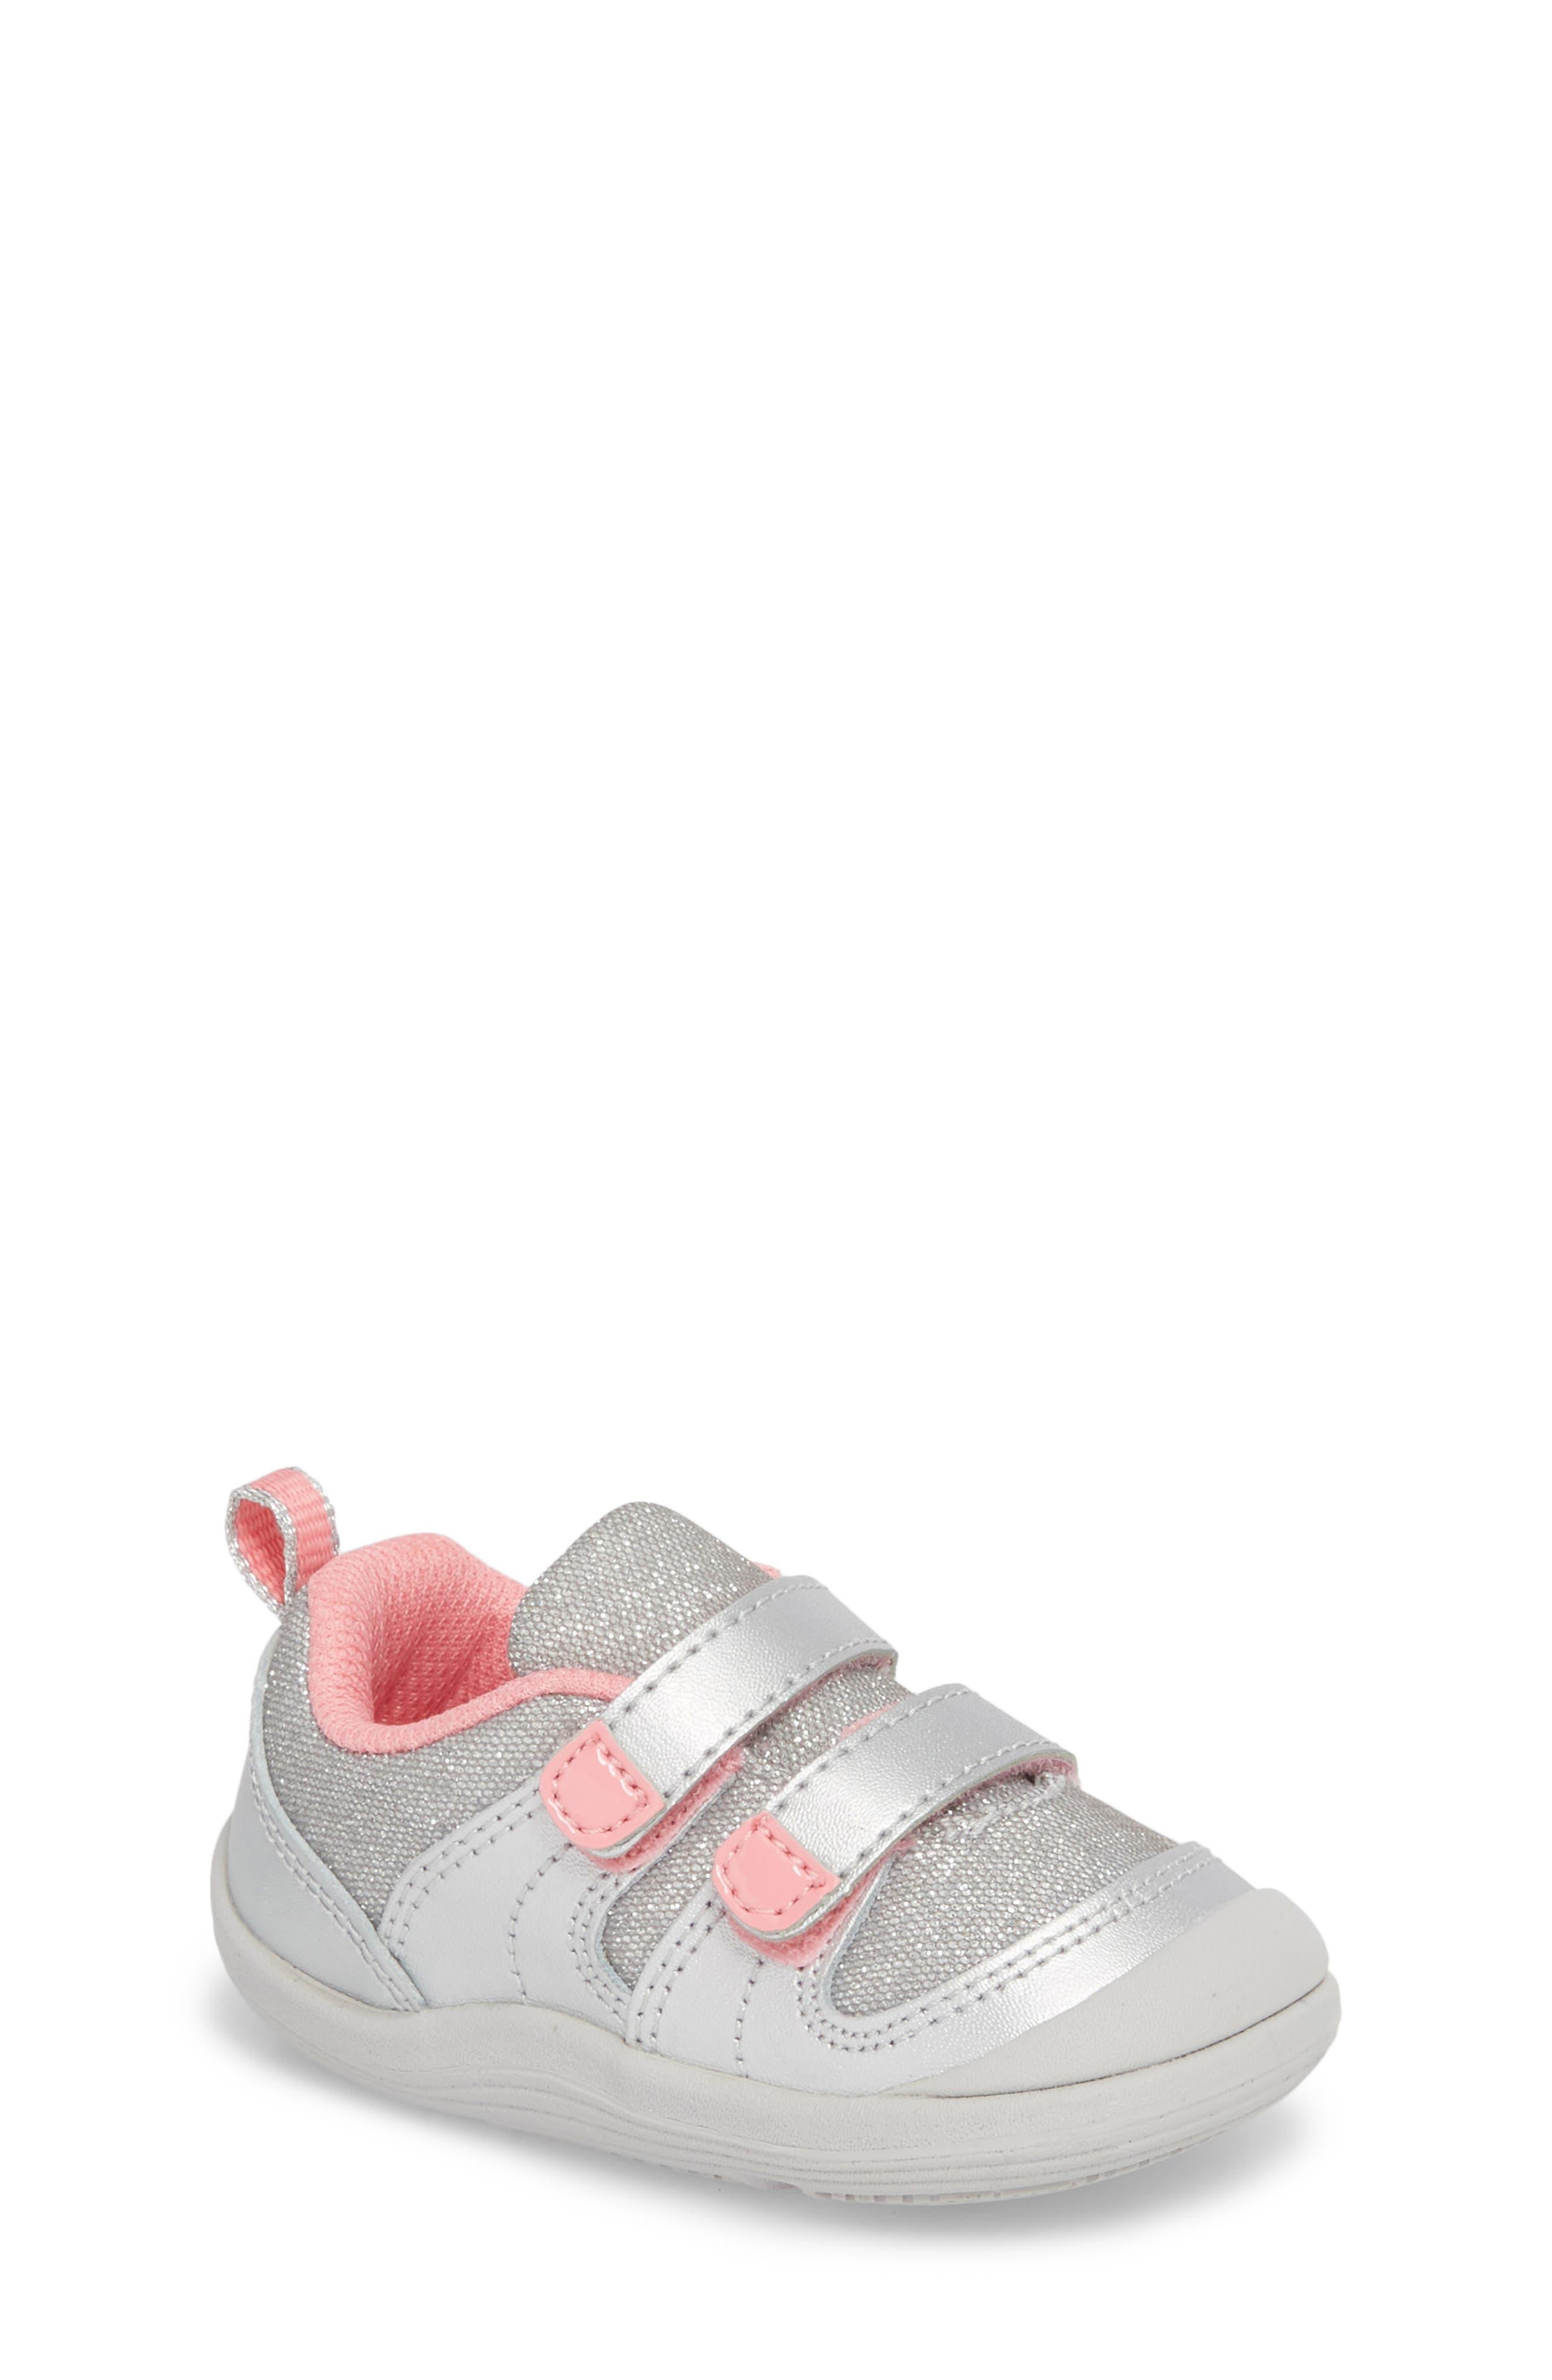 Tucker + Tate Maura Metallic Sneaker (Baby & Walker)